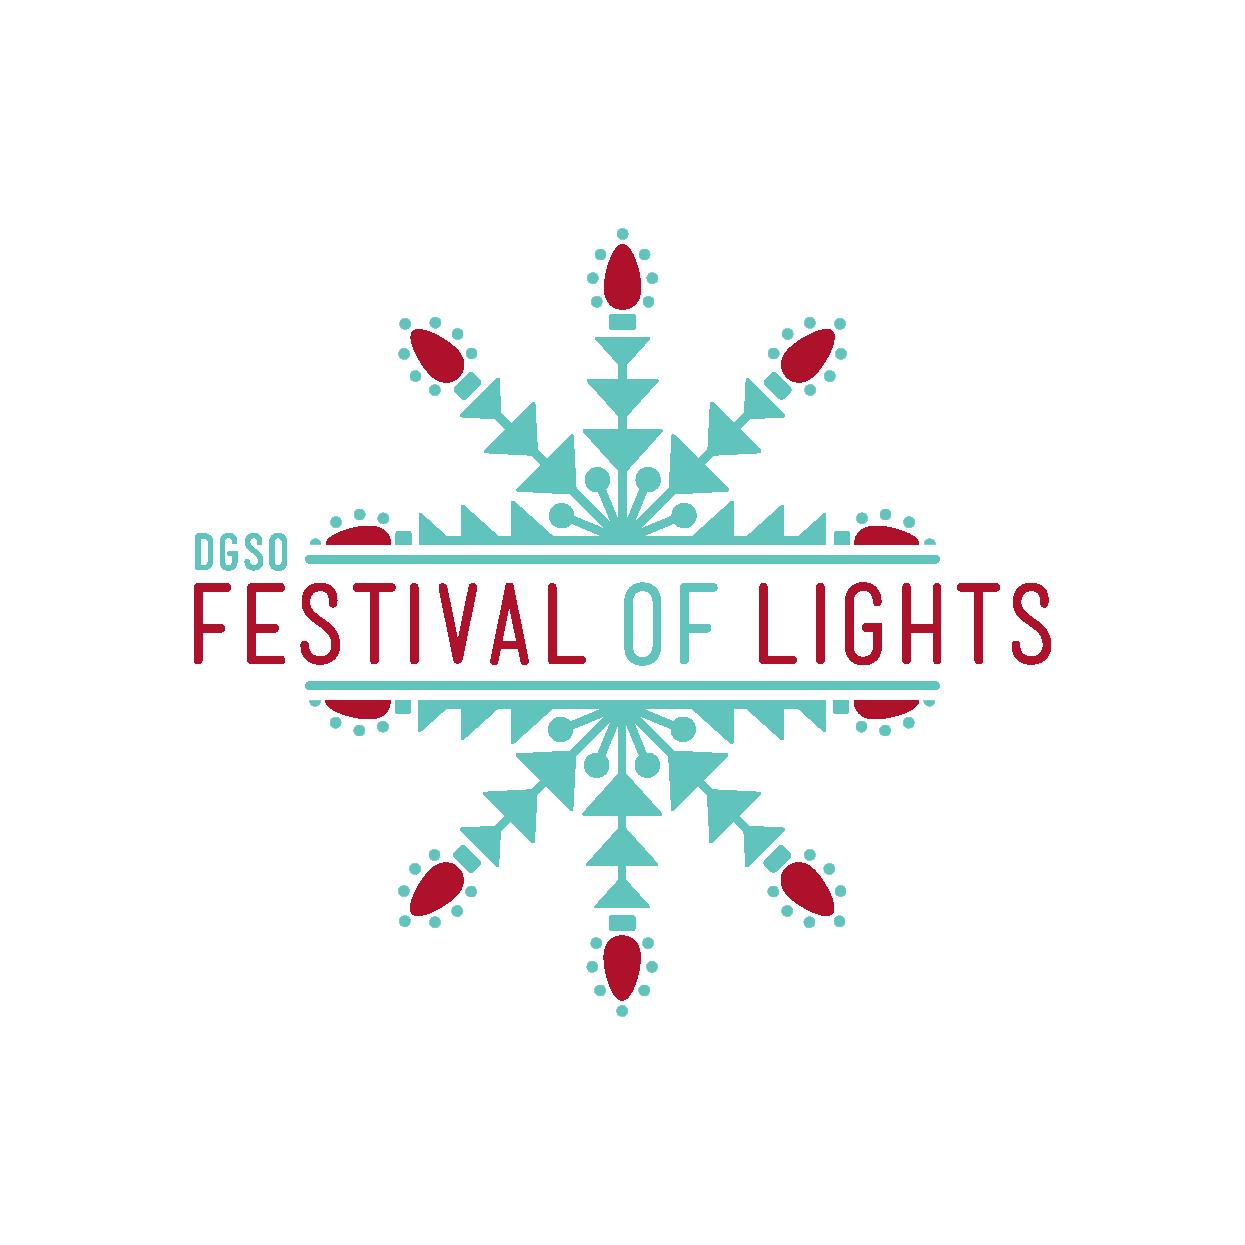 DGI_2017_FestOfLights.png